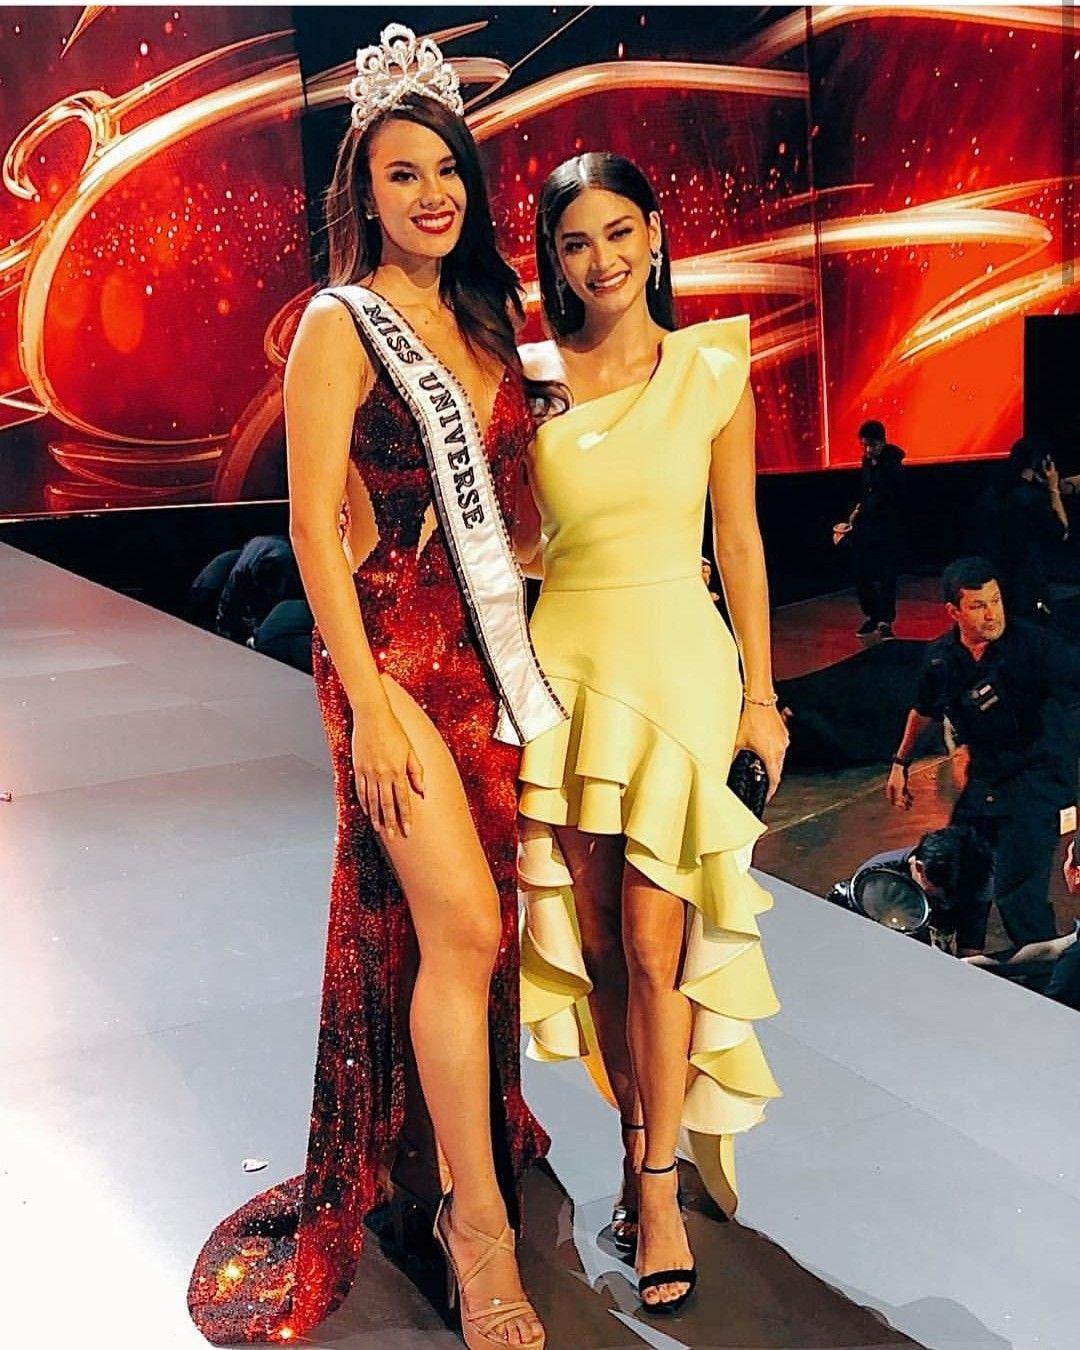 cb14180ef Coronation night Miss universe 2018 catriona gray and miss universe 2015  pia wurtzbach